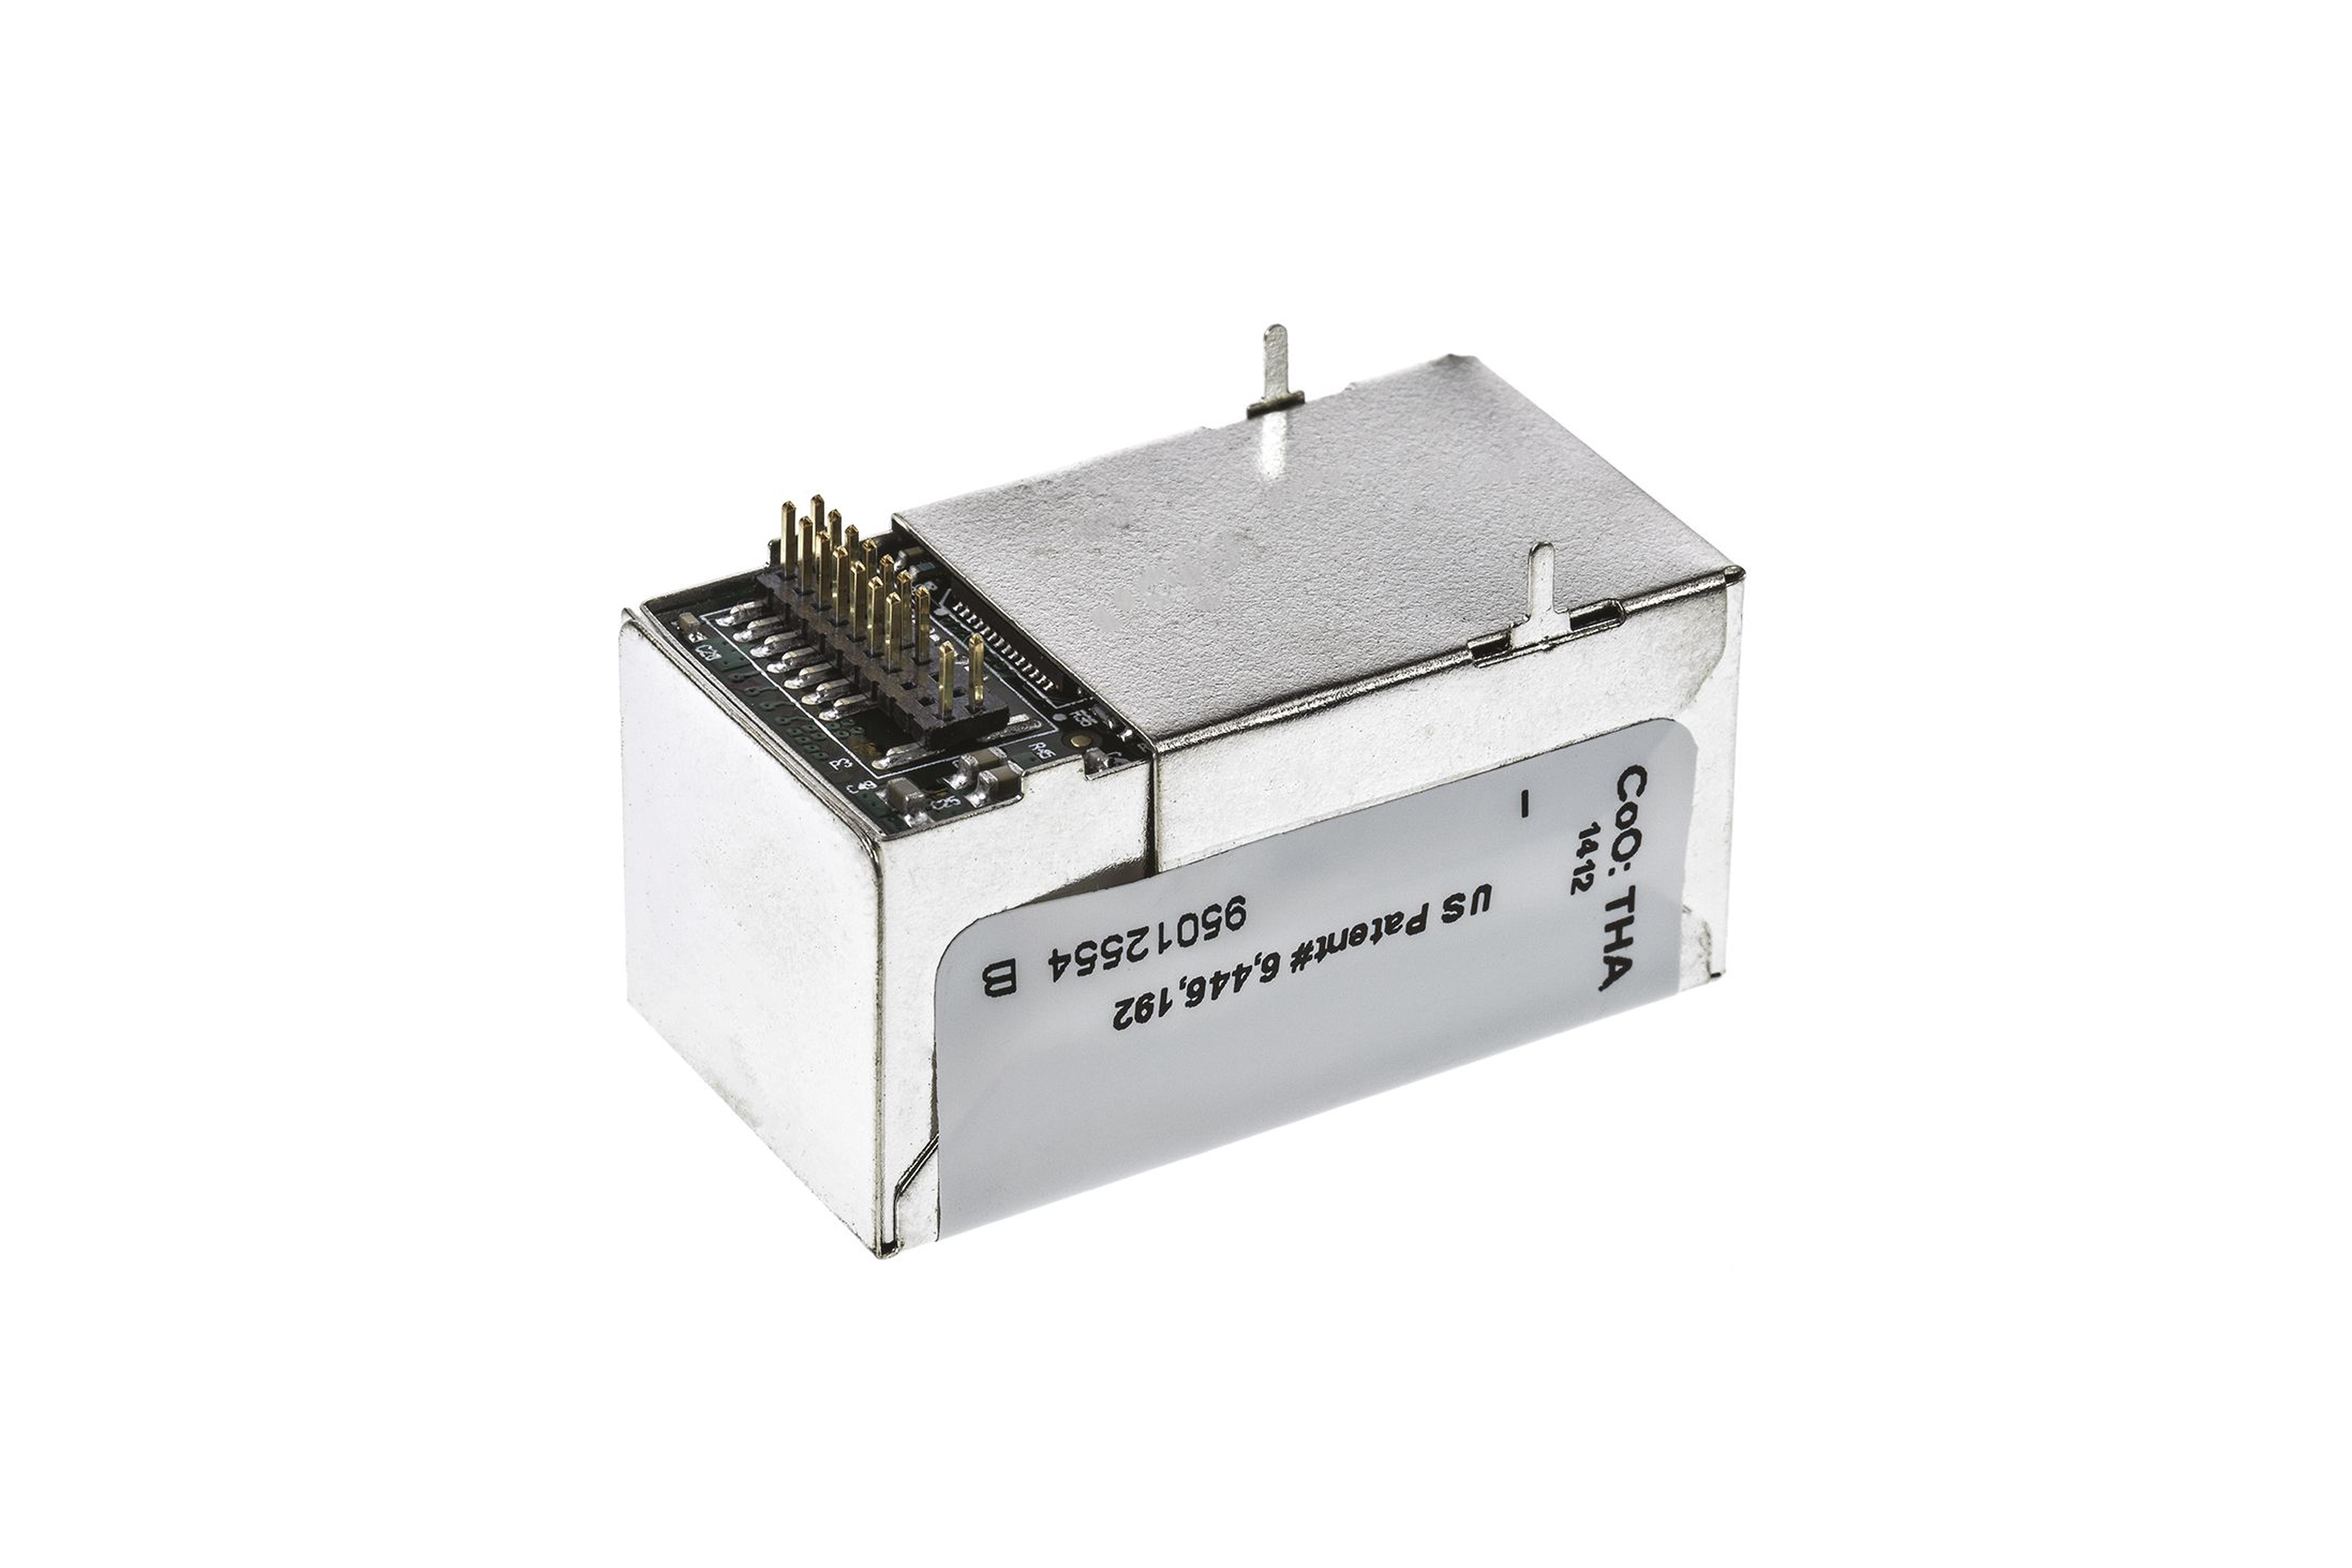 Modulo DIGI Connect ME9210